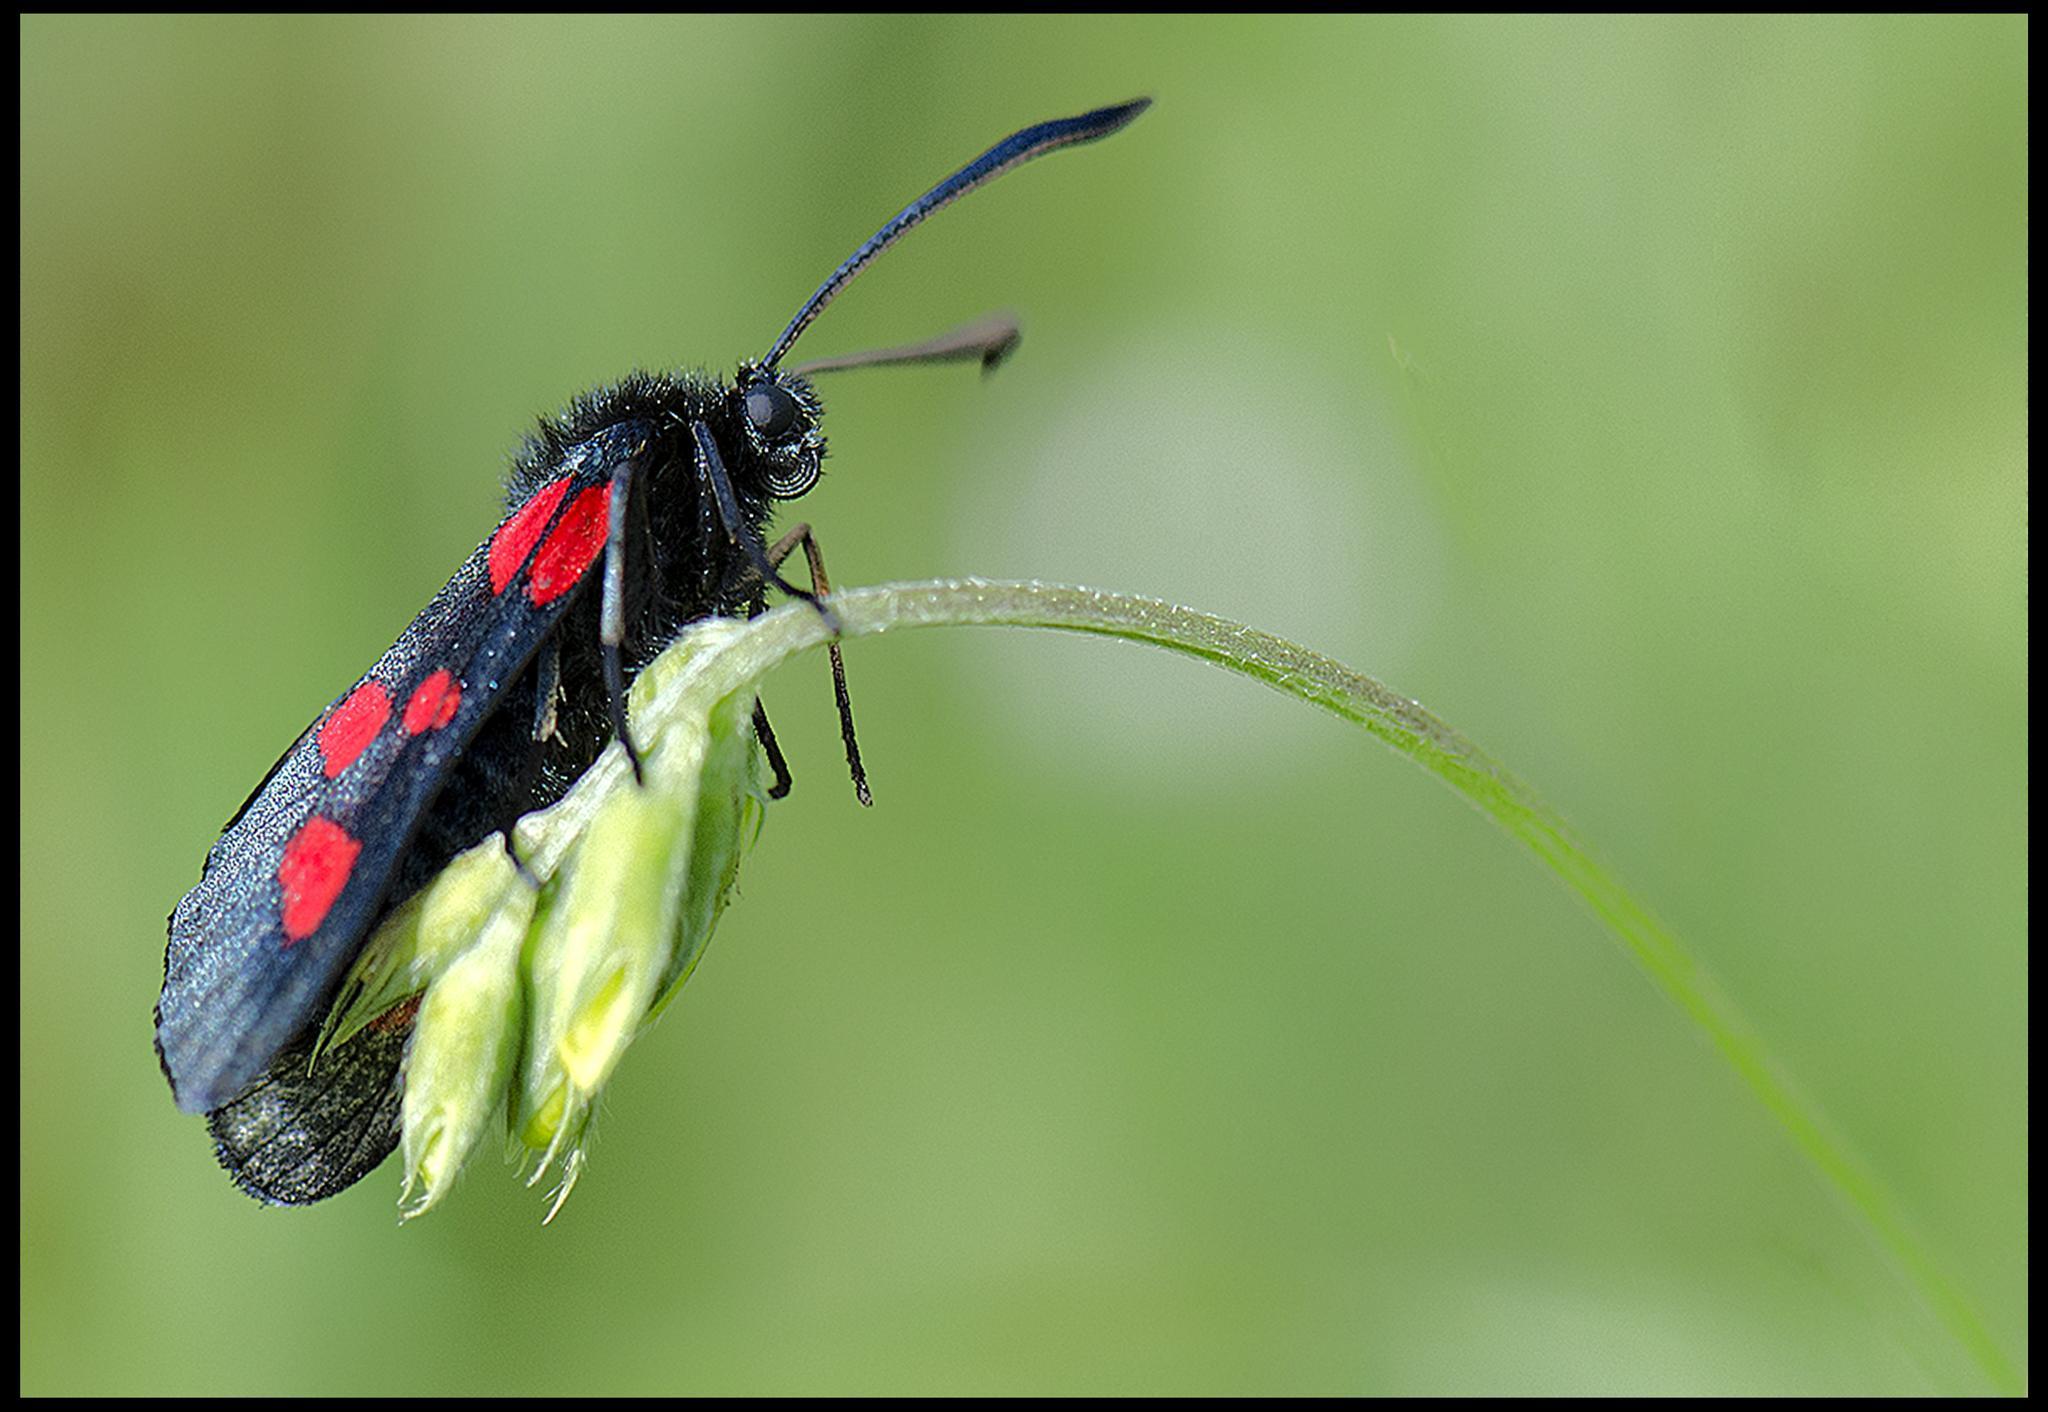 moth by angela.taylor.142035